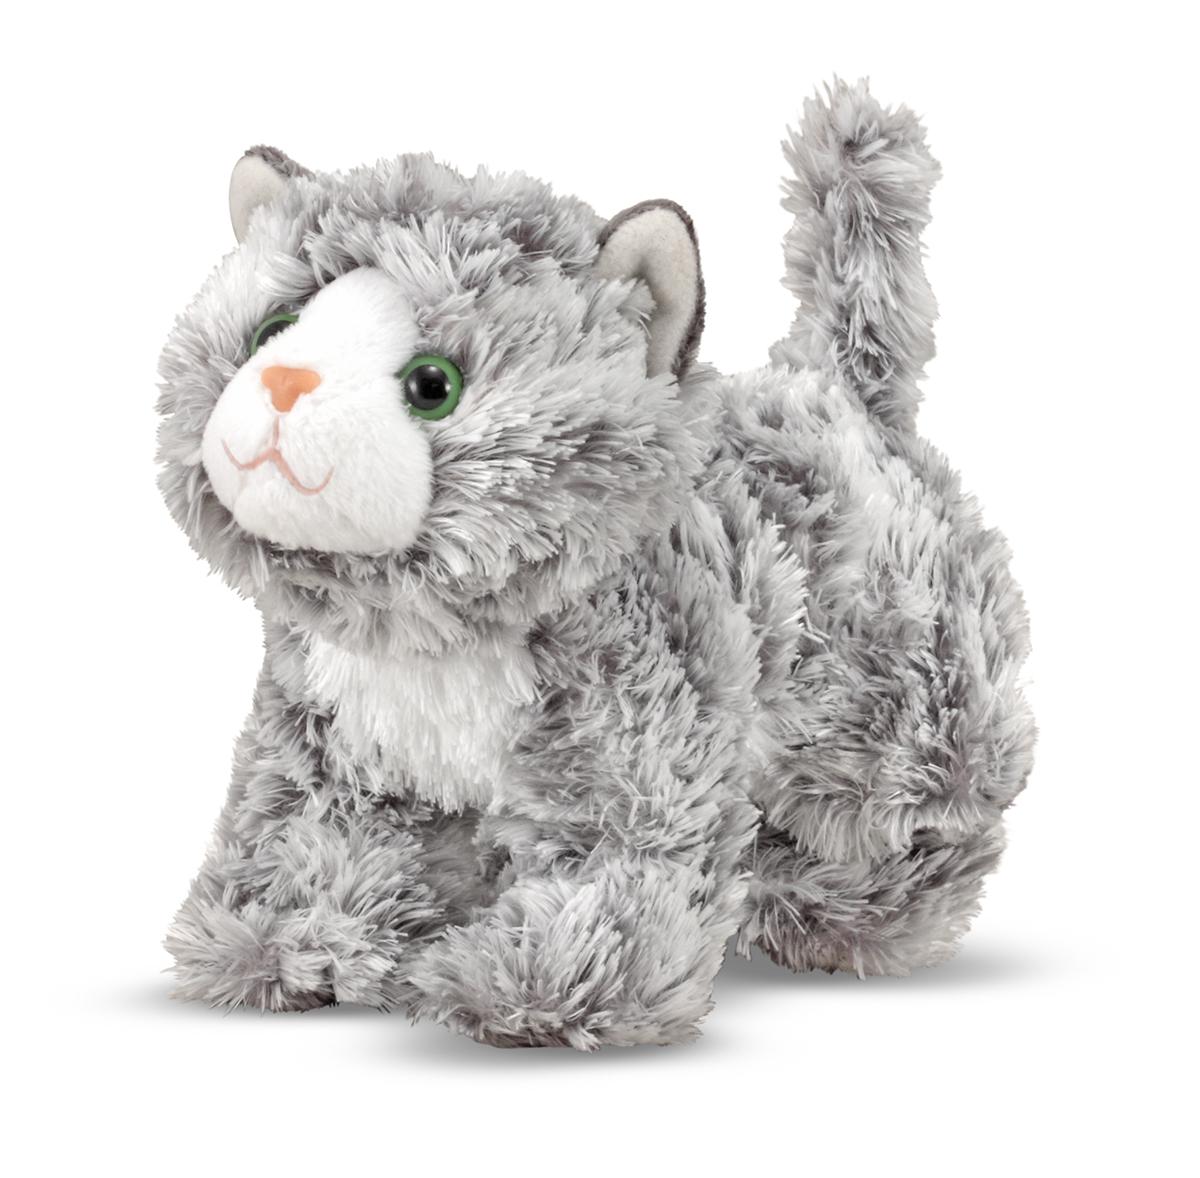 Мягкая игрушка  Кошка Рокси , 13 см. - Коты, артикул: 138717